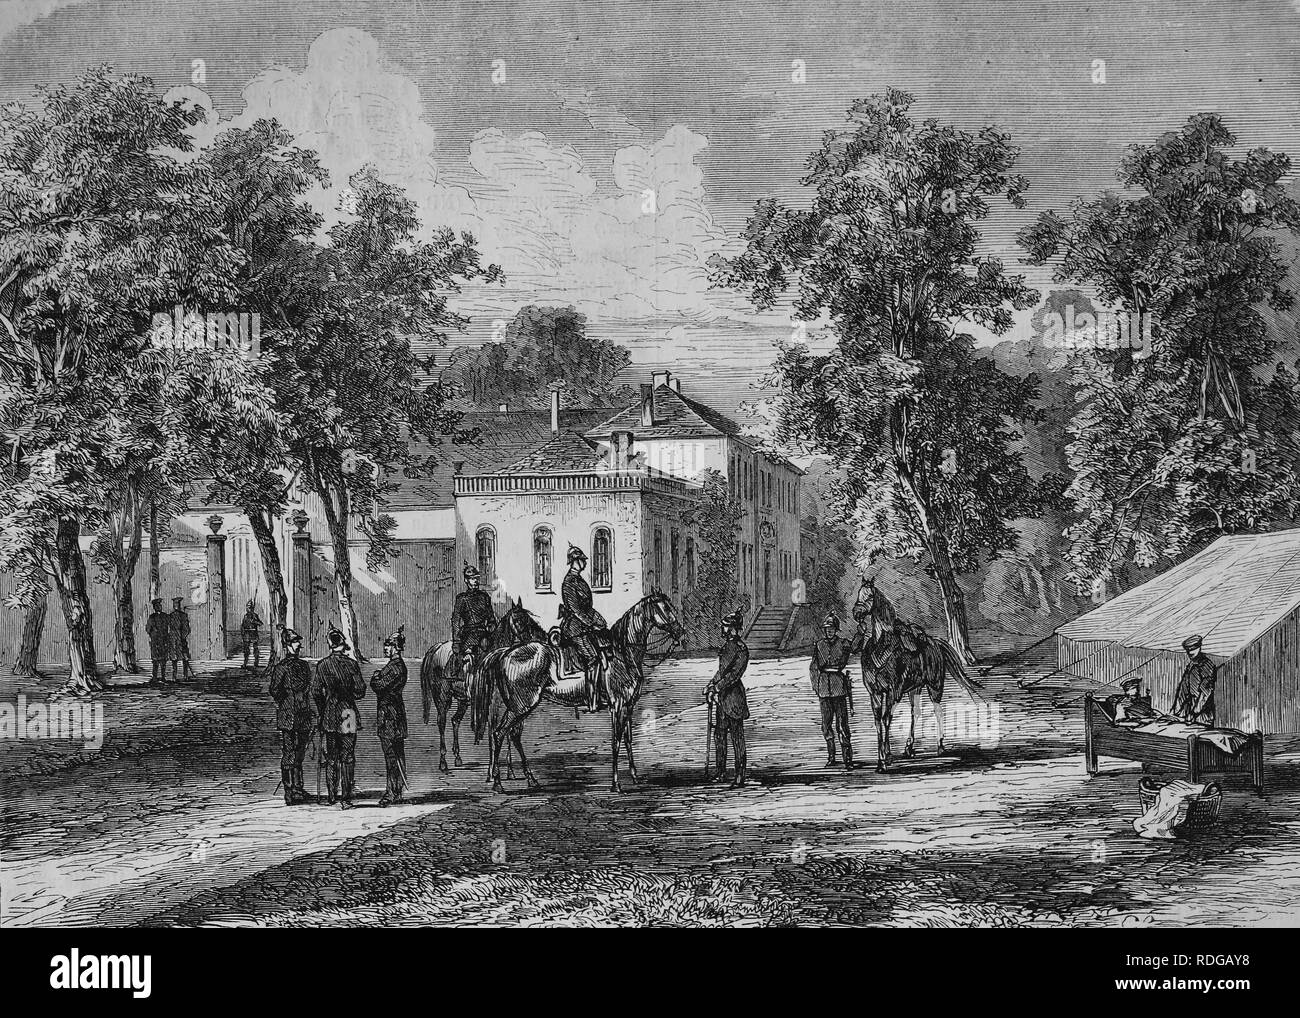 Headquarters of Prince Friedrich Carl zu Corny, near Metz, historic illustration, illustrated war chronicle 1870 to 1871 - Stock Image